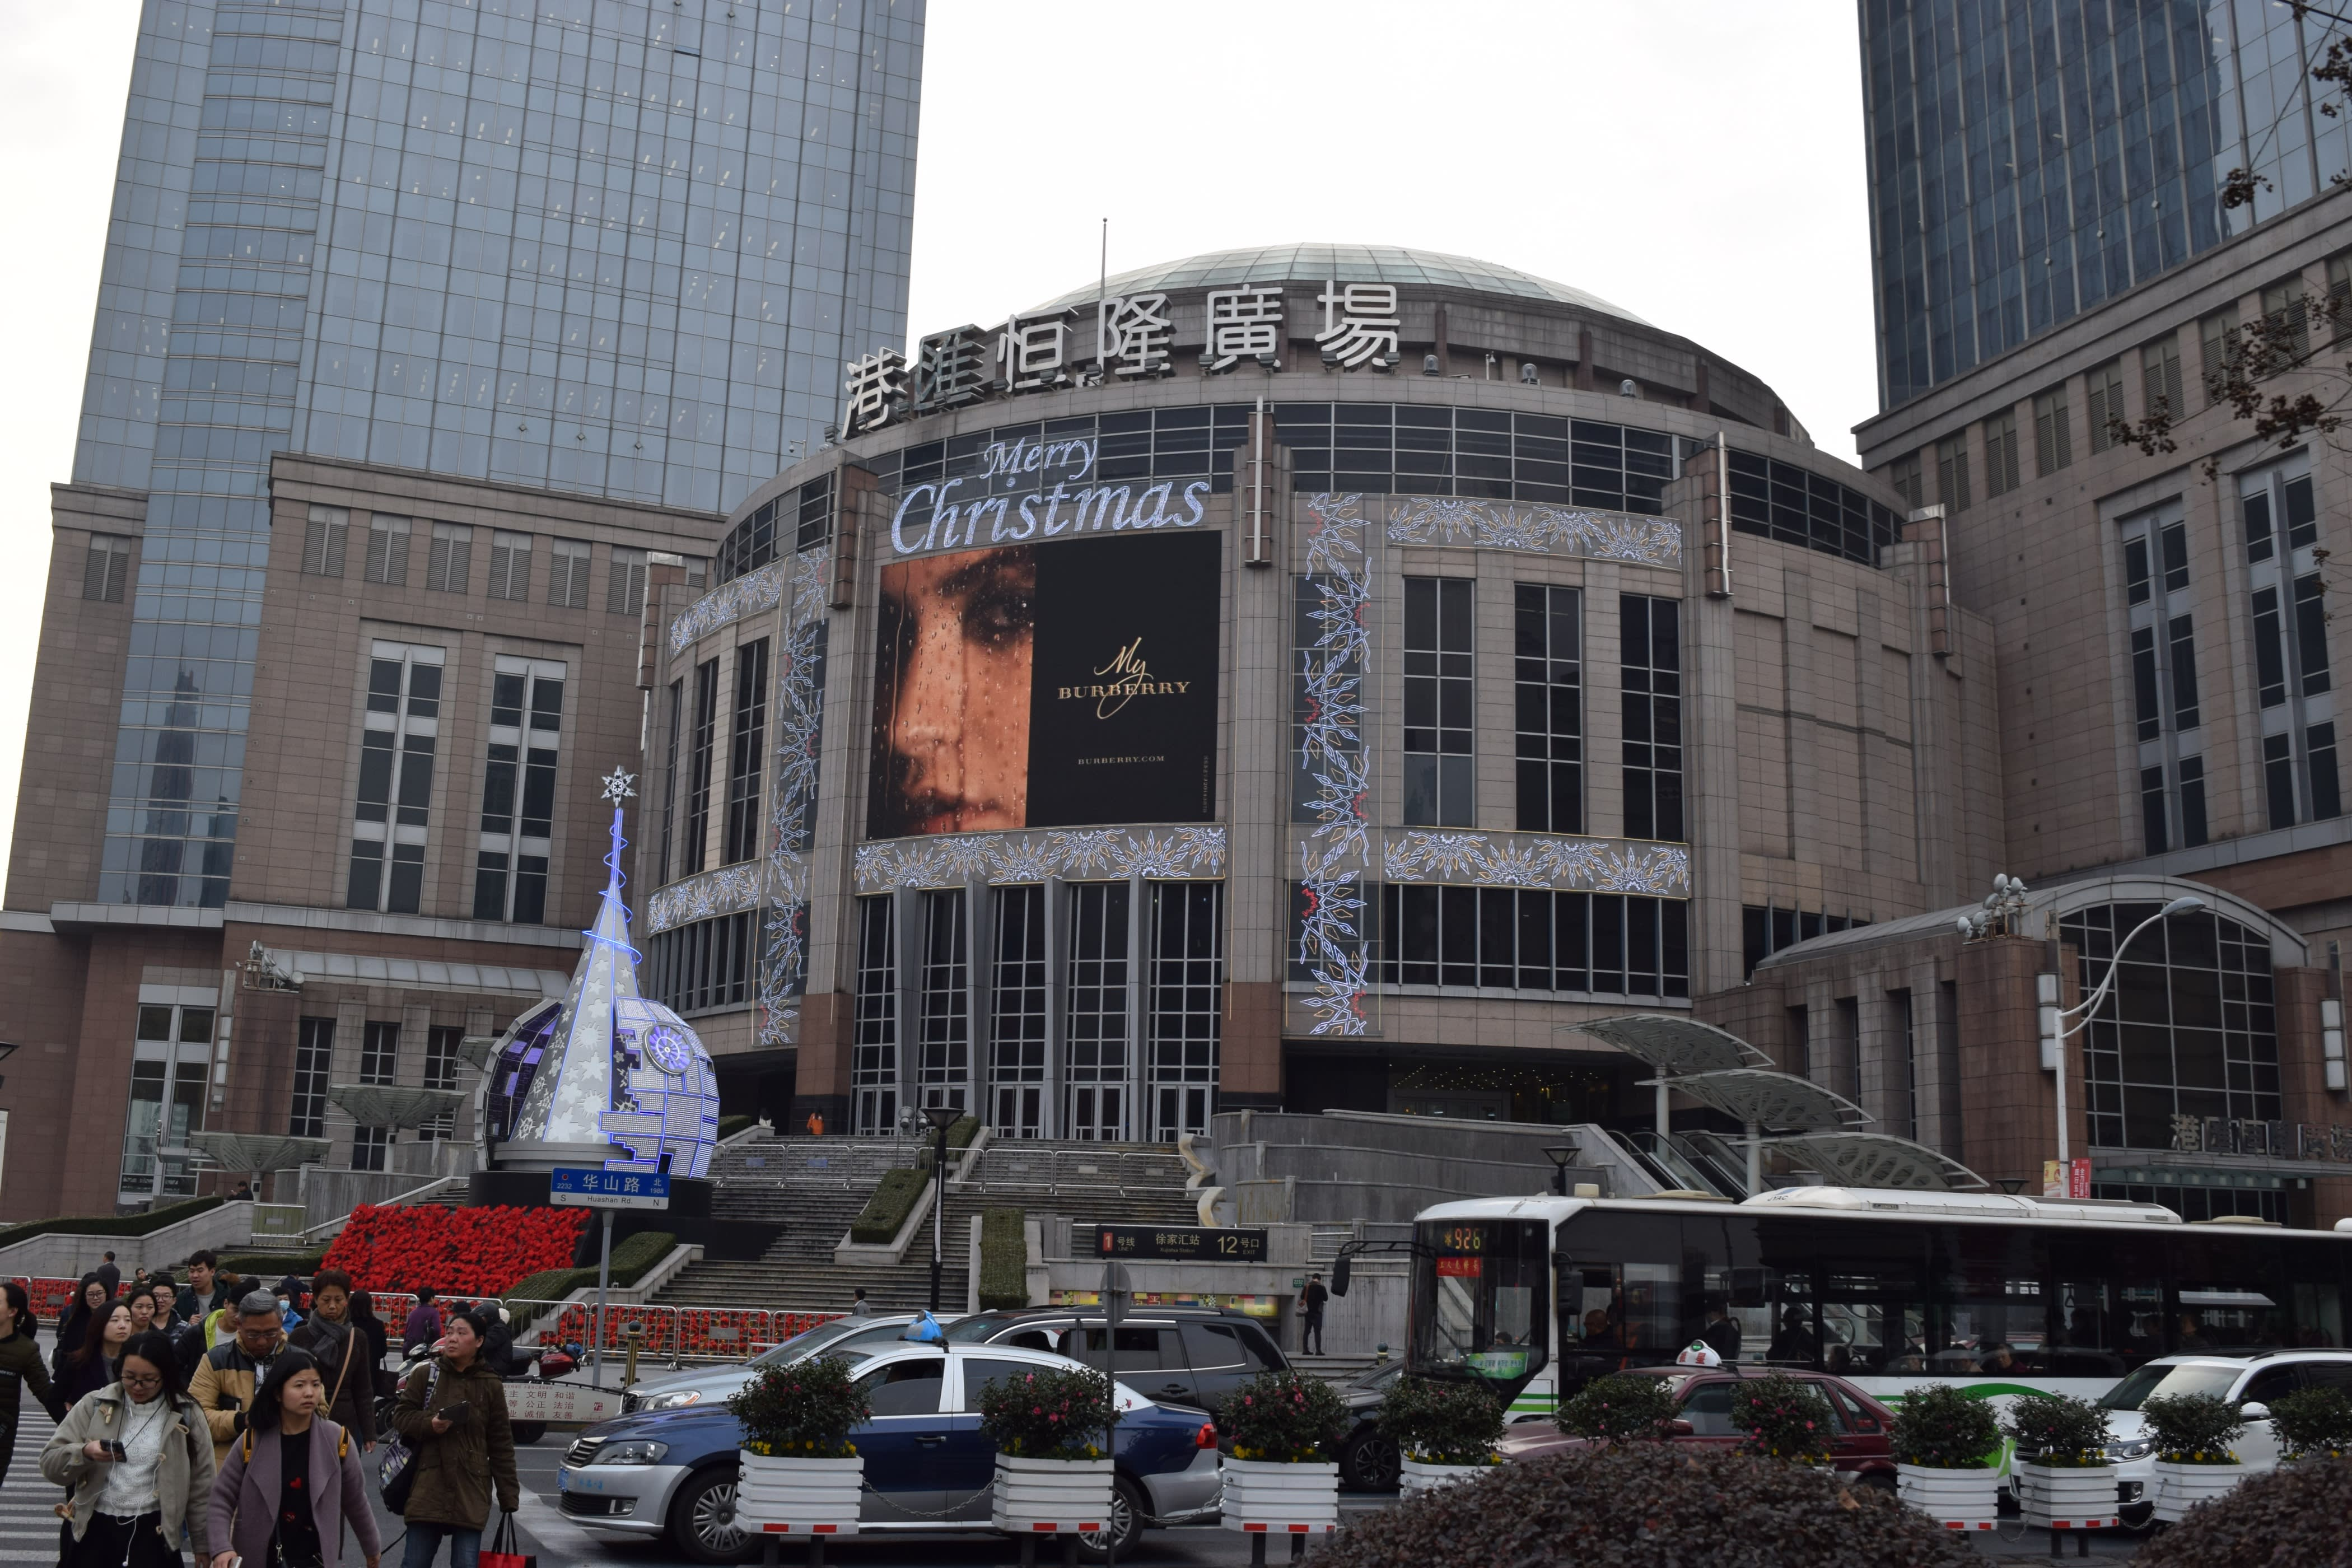 Hong Kong capitalists reap rewards of cozy Communist ties